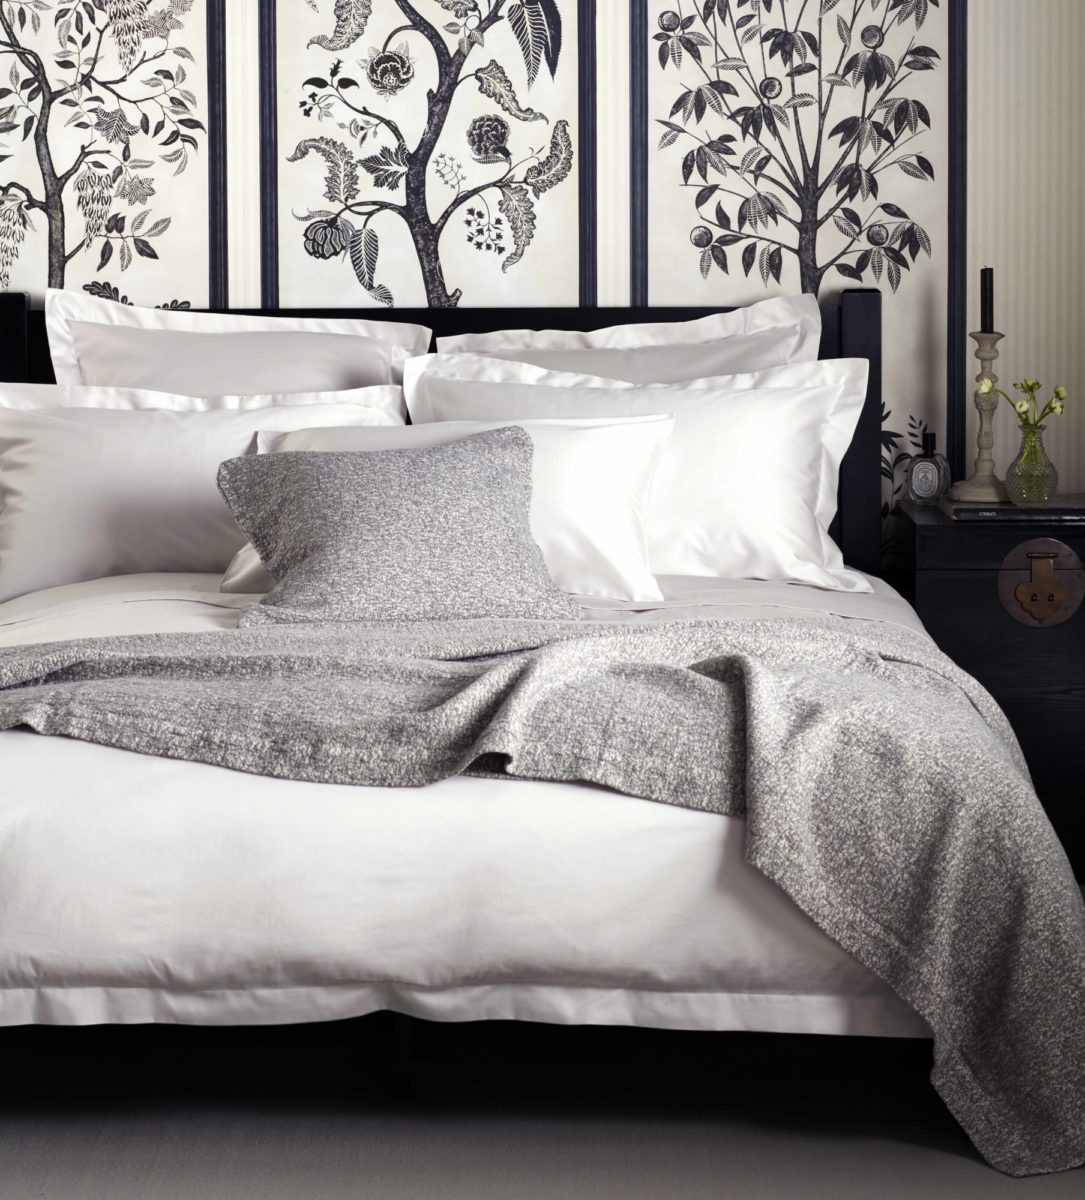 600 Thread Count Antique White Luxury Bedding | Secret Linen Store